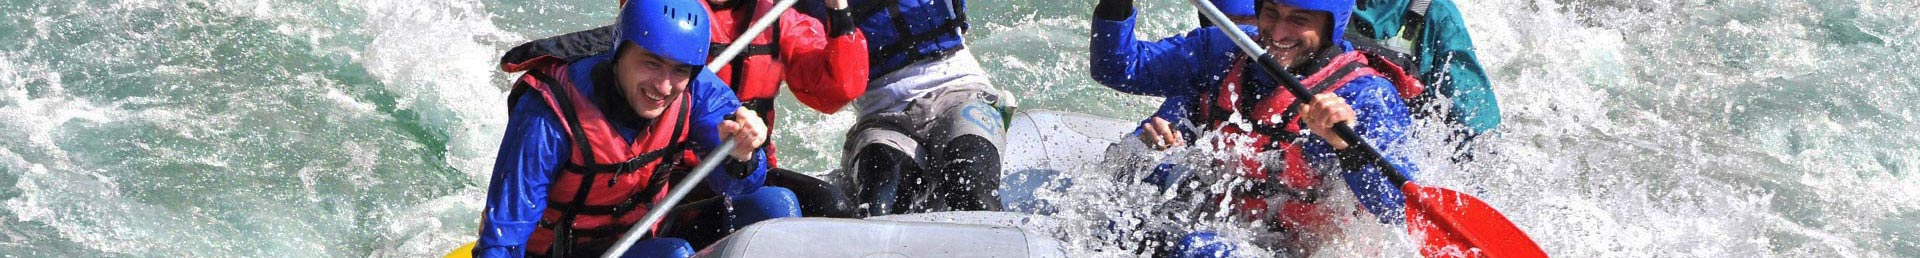 Rafting Midi-Pyrénées